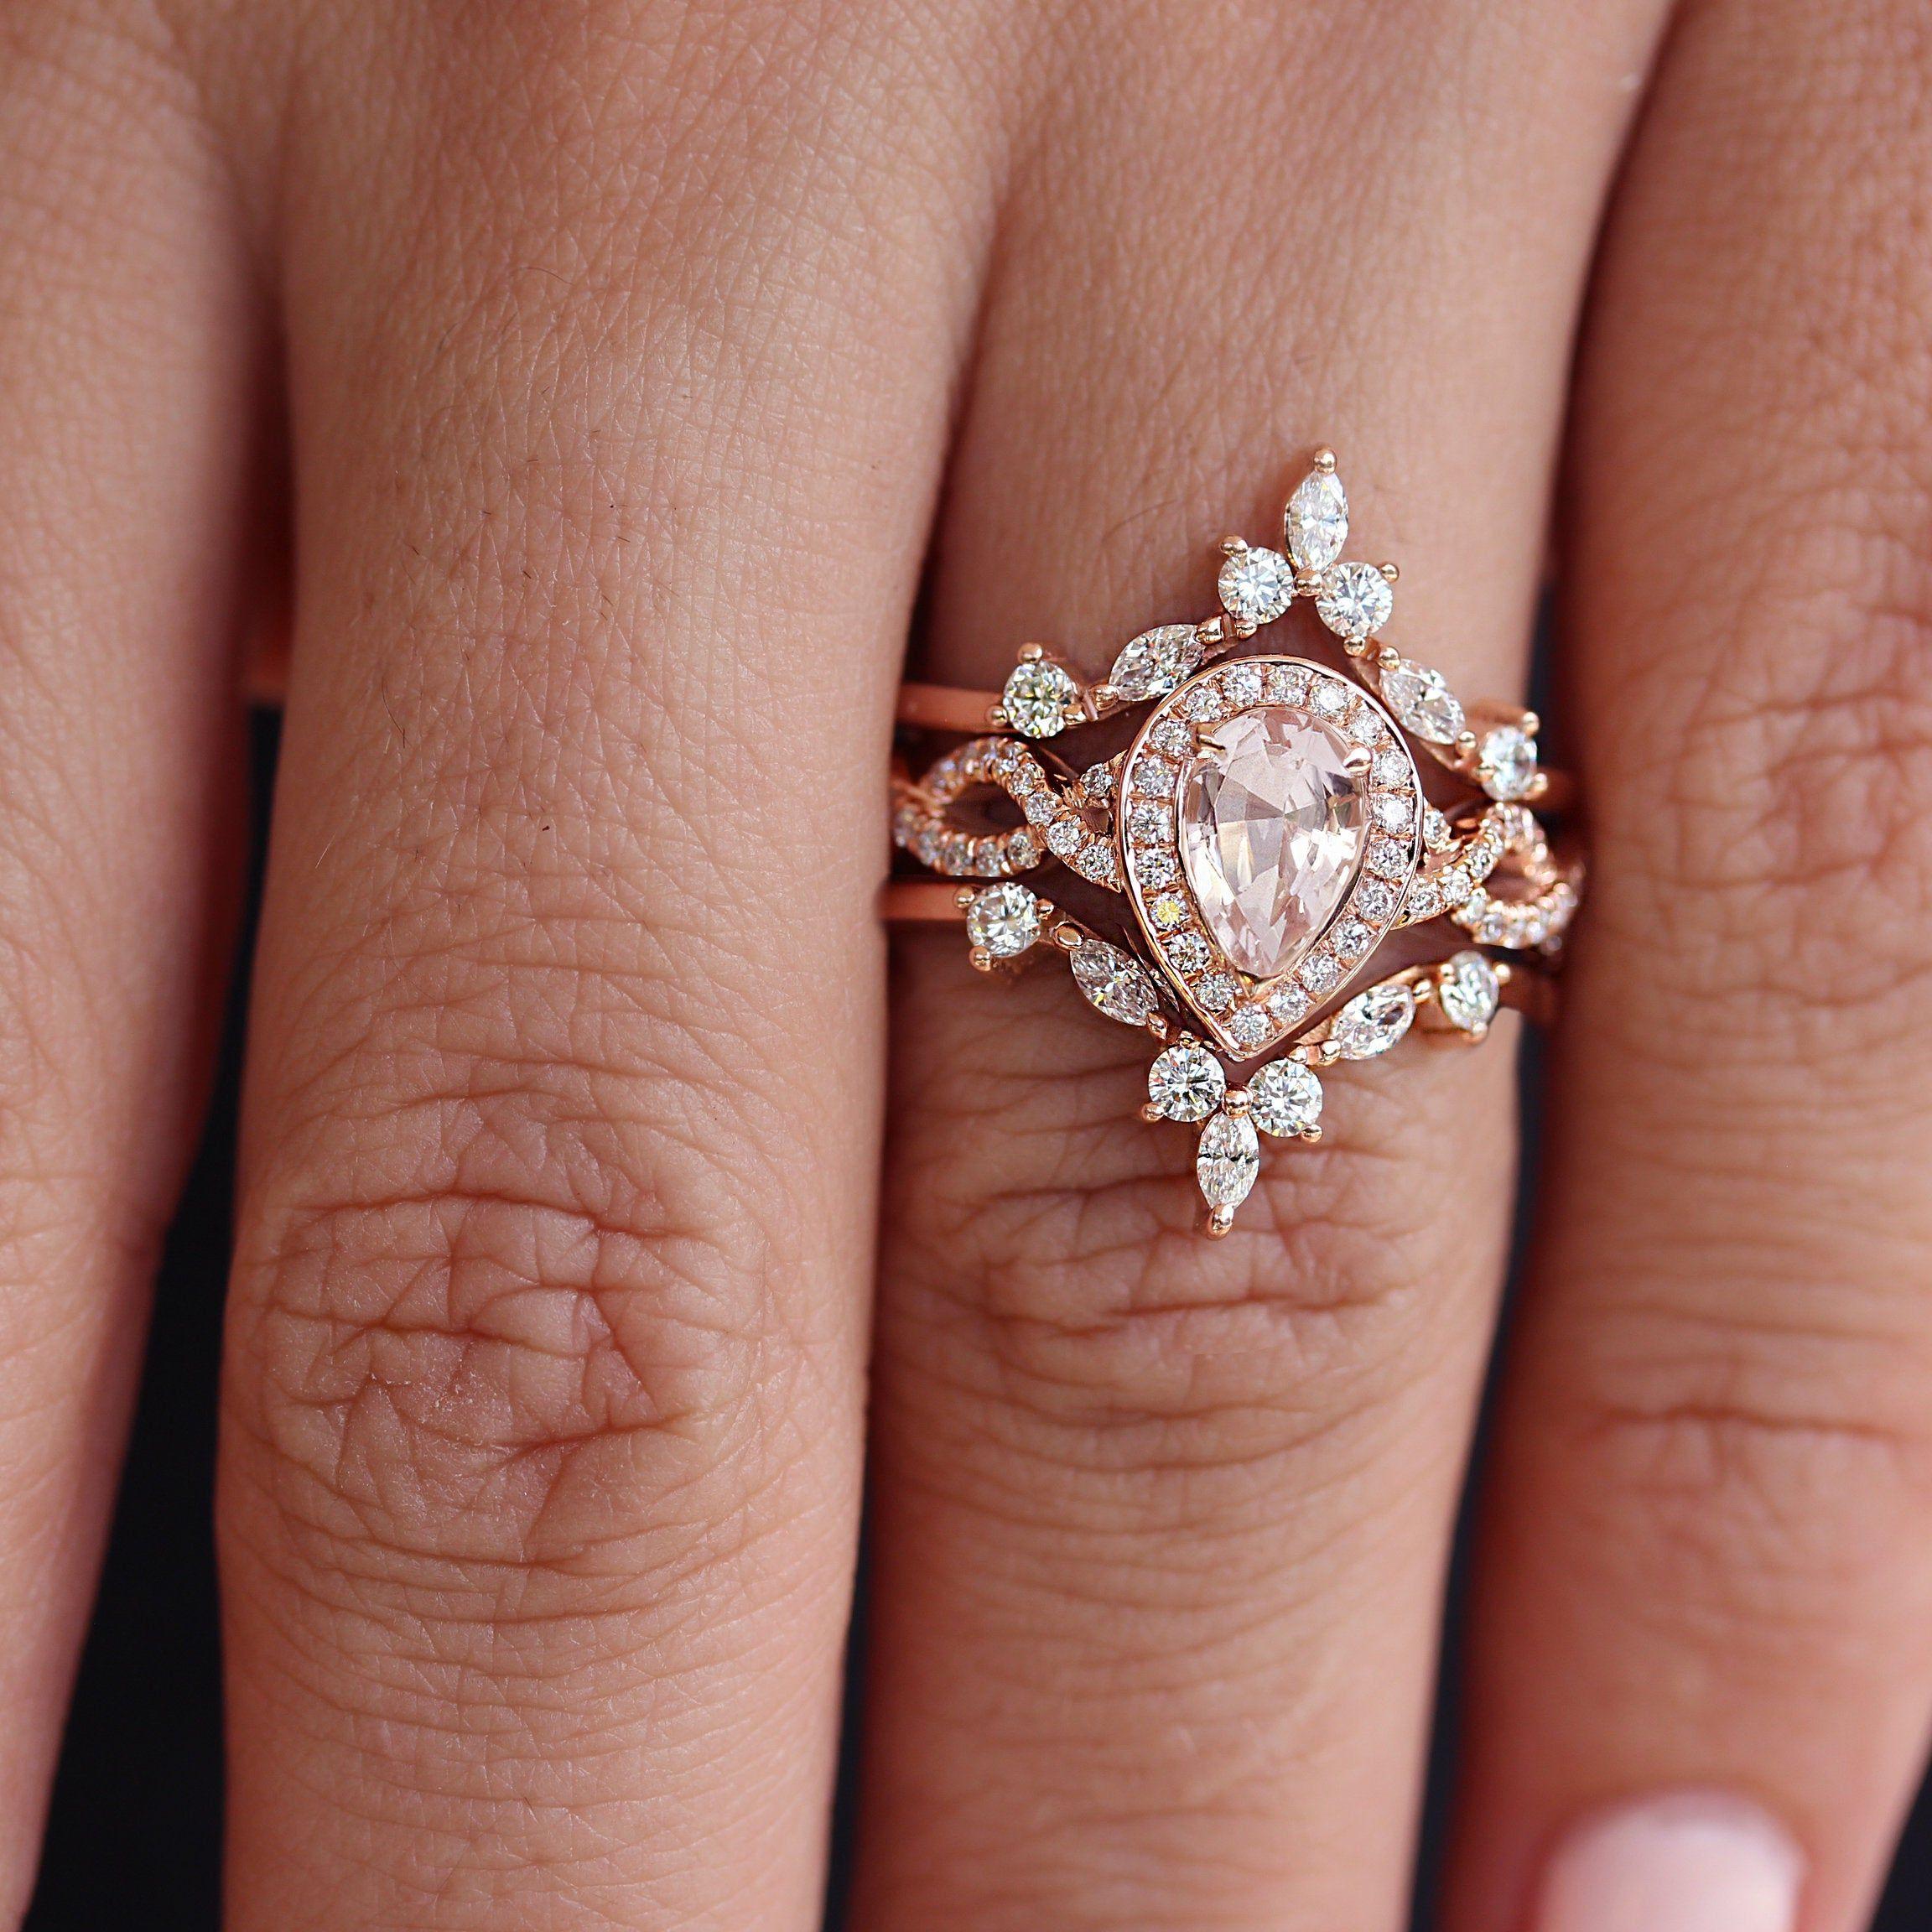 Pear Morganite Diamond Halo Twist Shank With Ring Guards Enhancers Unique Engagement Ring Set Hermes Victorian Engagement Rings Wedding Rings Teardrop Wedding Rings Vintage